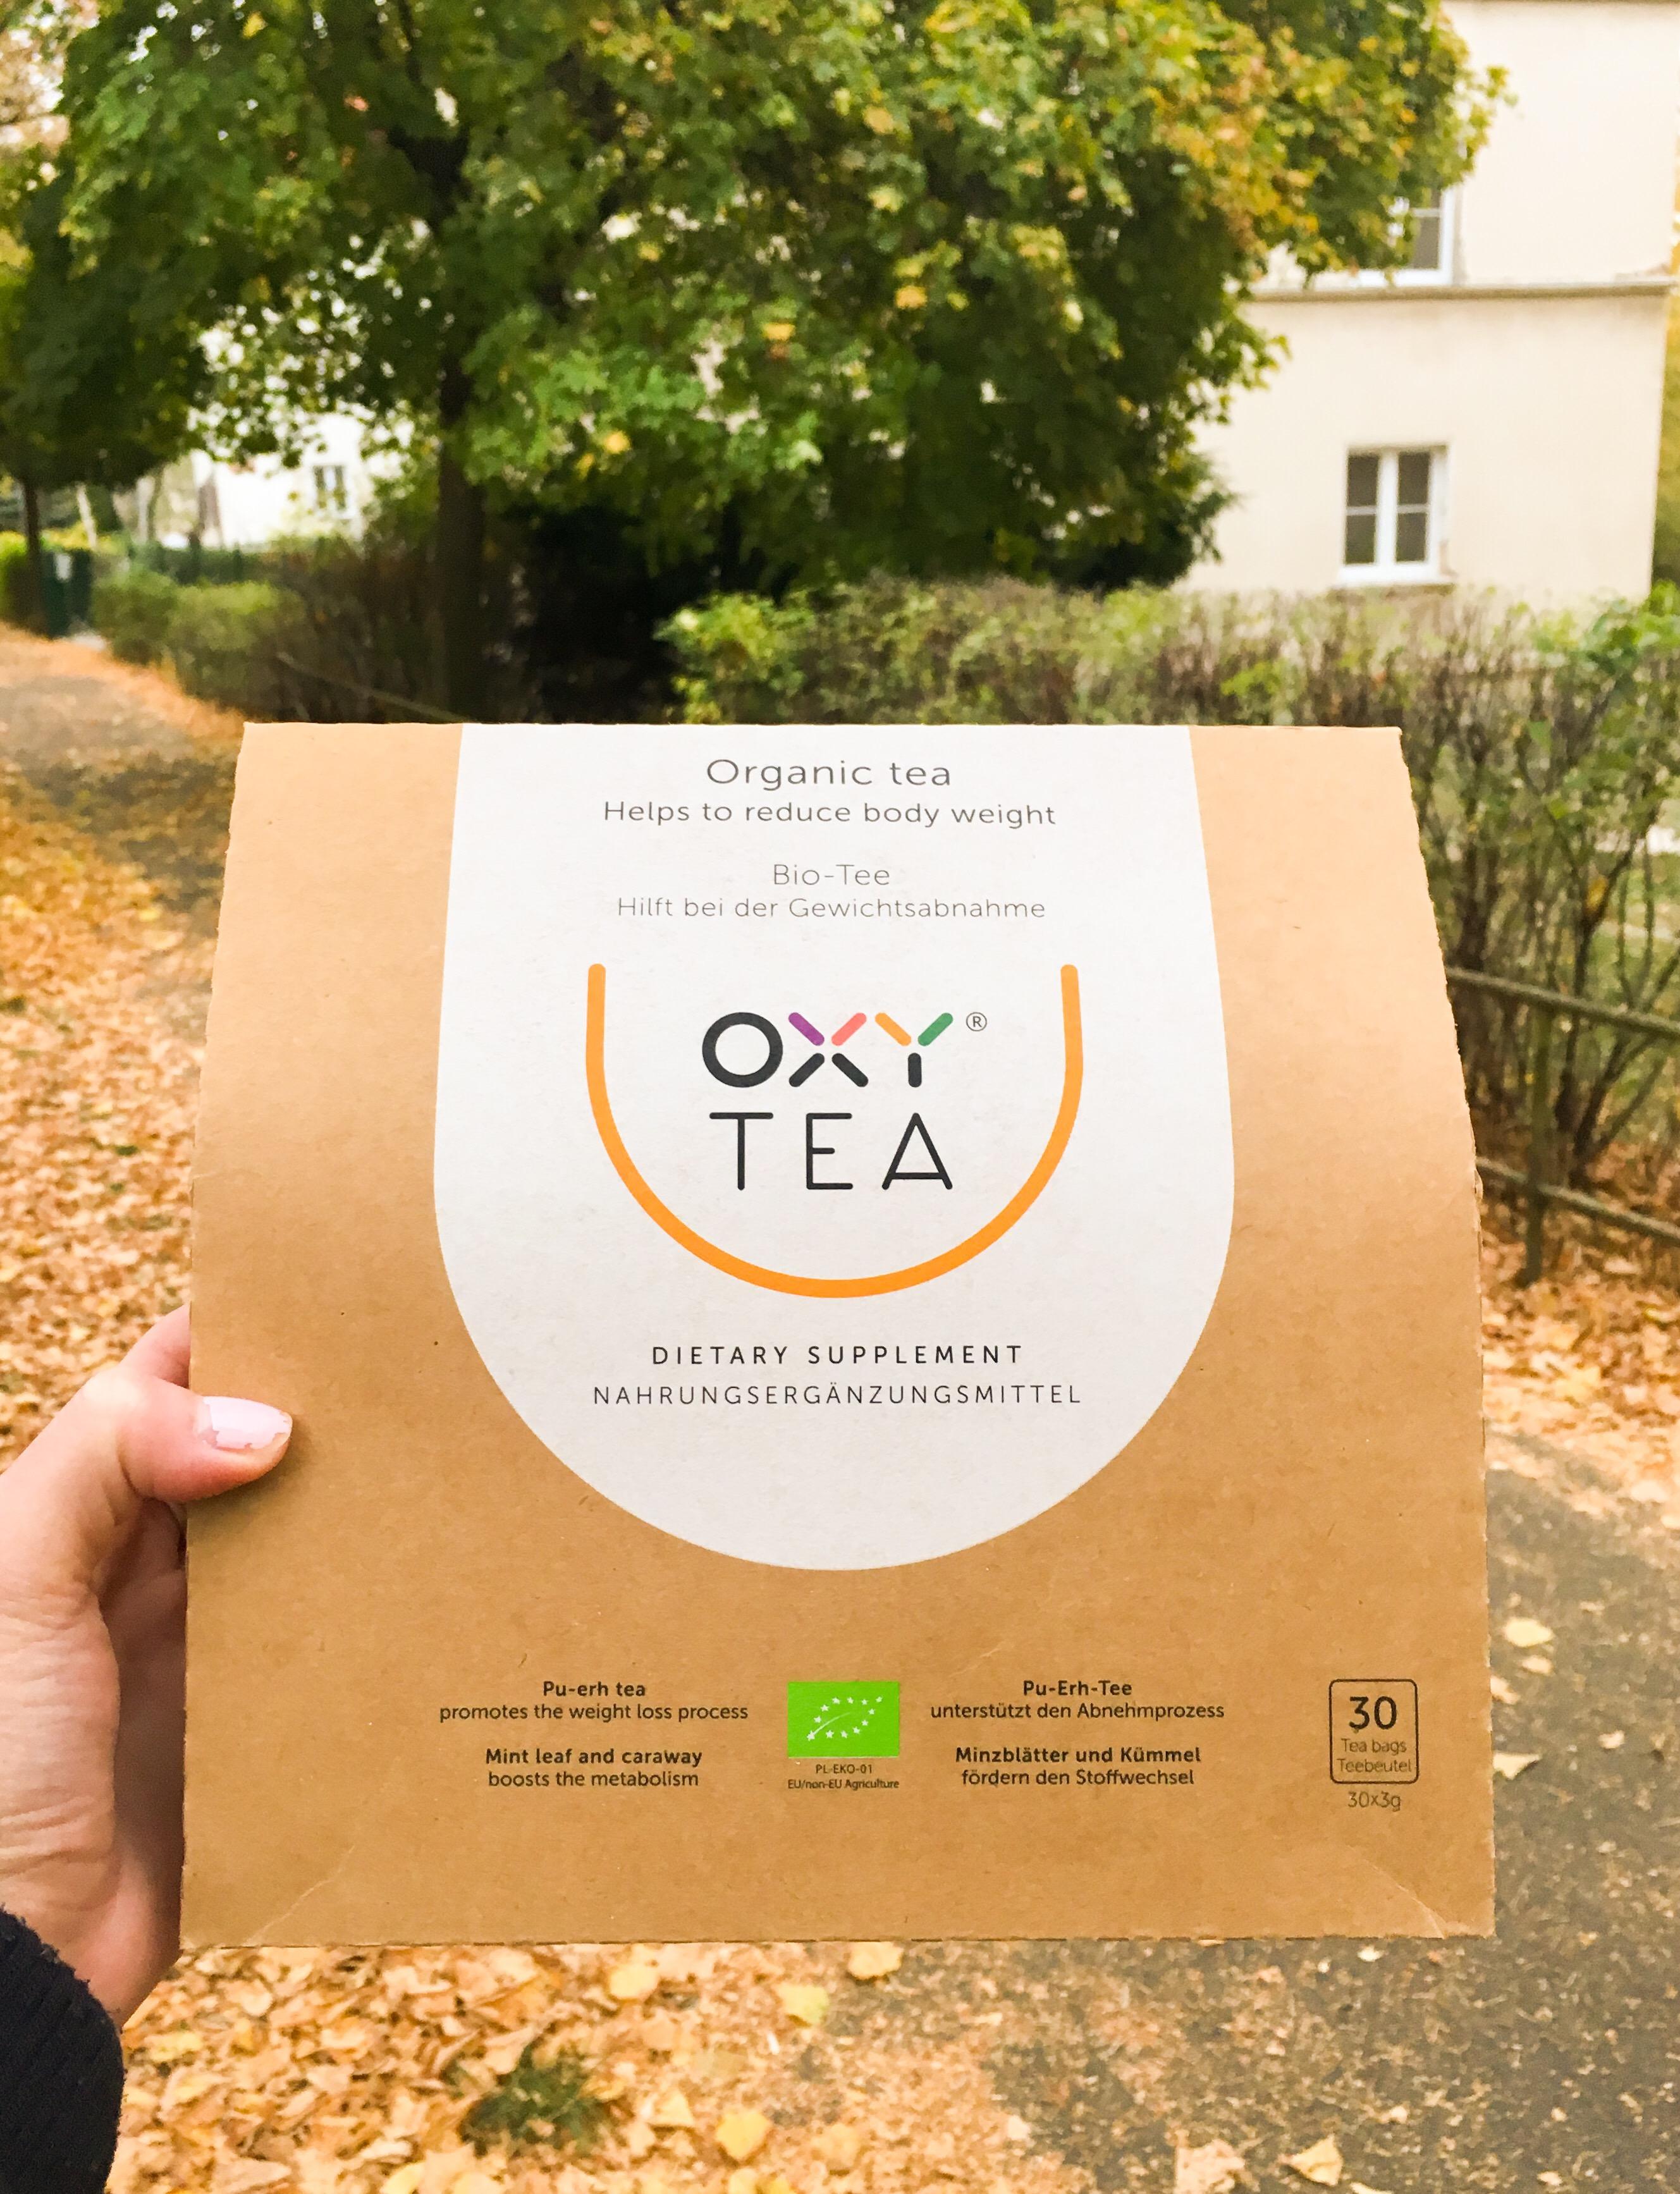 OXY TEA